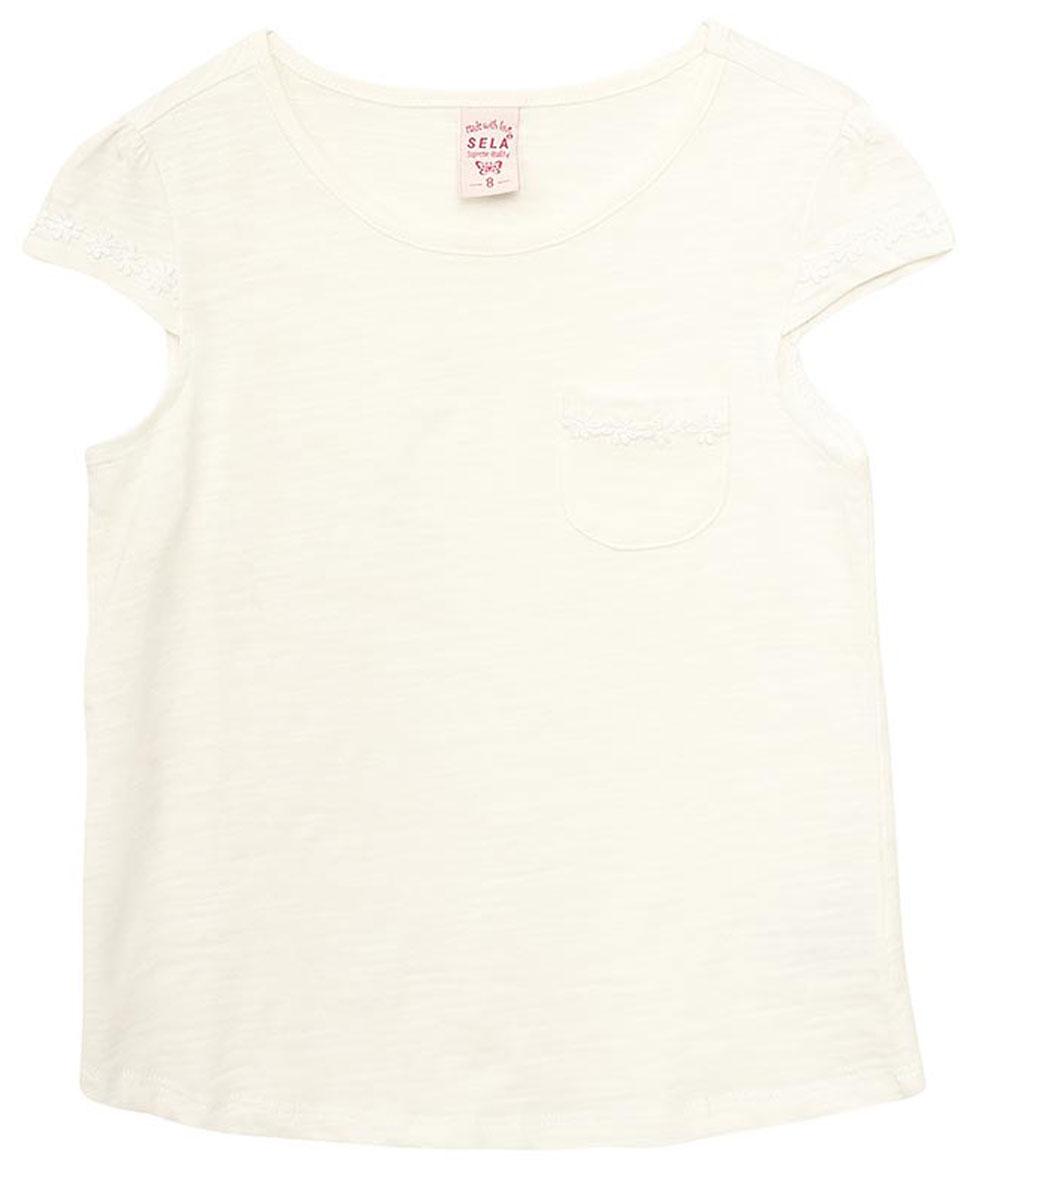 Футболка для девочки Sela, цвет: молочный. Ts-611/957-7172. Размер 152, 12 лет футболка для девочки sela цвет лиловый tsl 611 984 7223 размер 152 12 лет